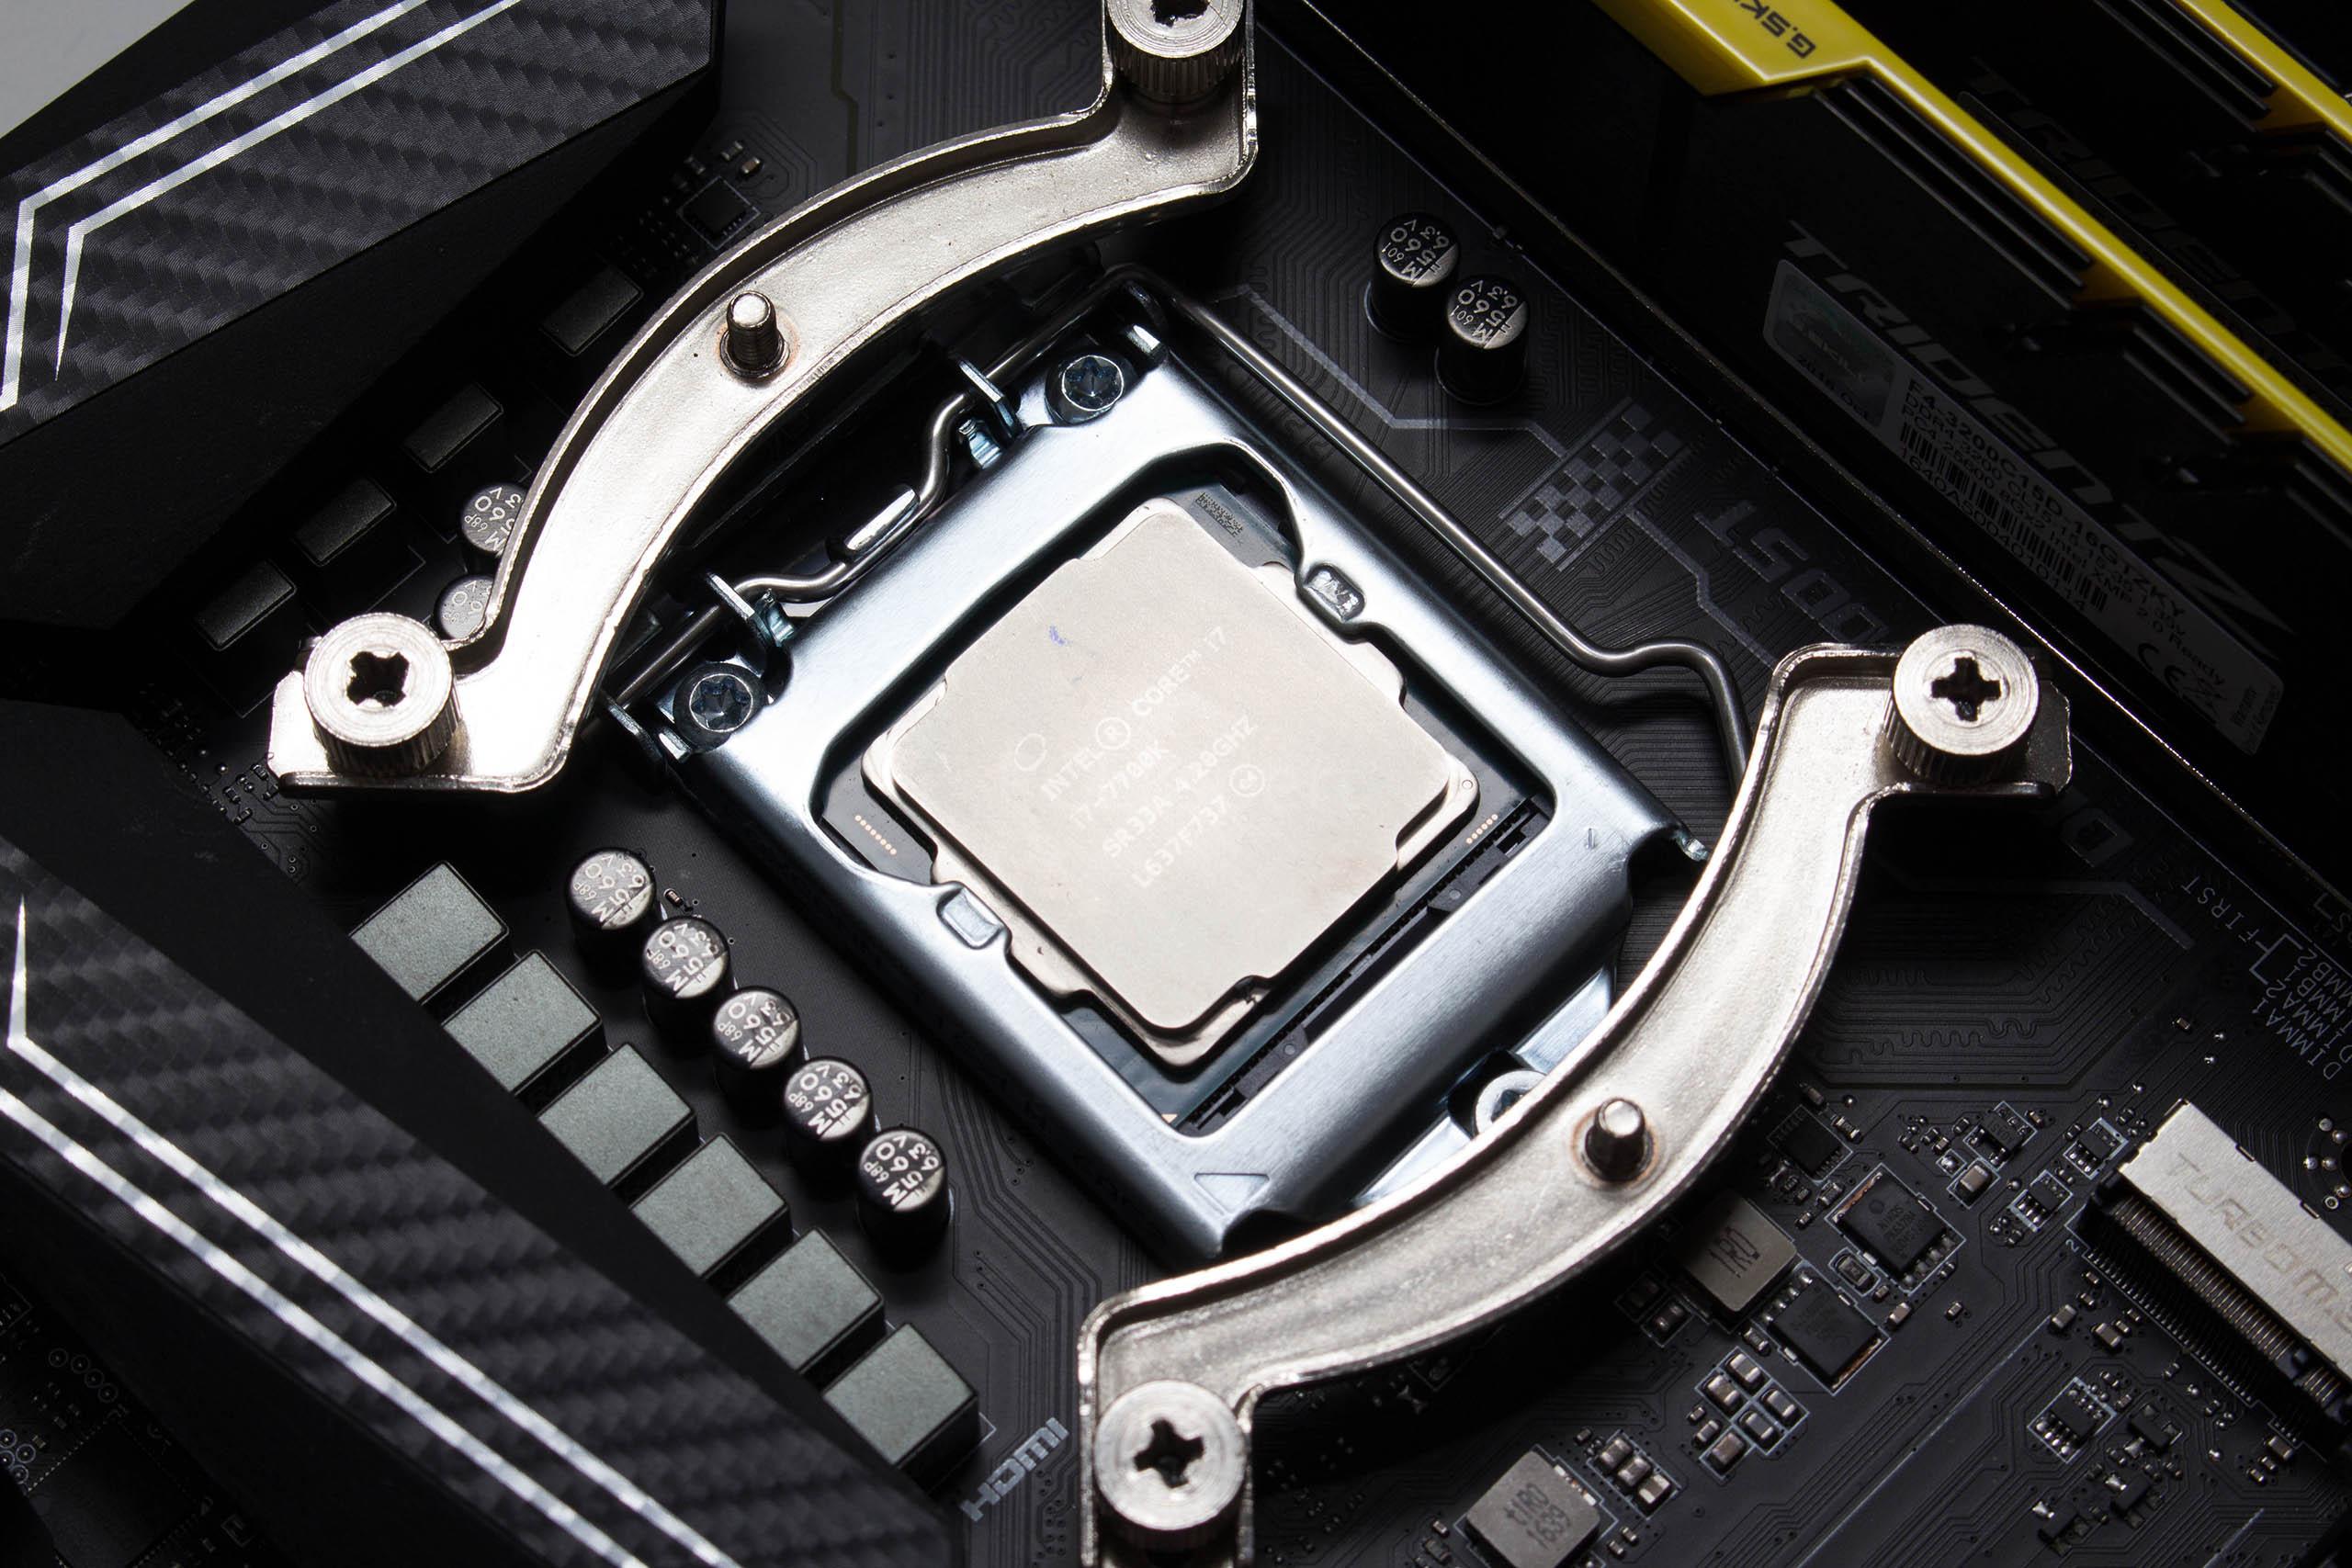 Intel Core i7 7700K recenzija